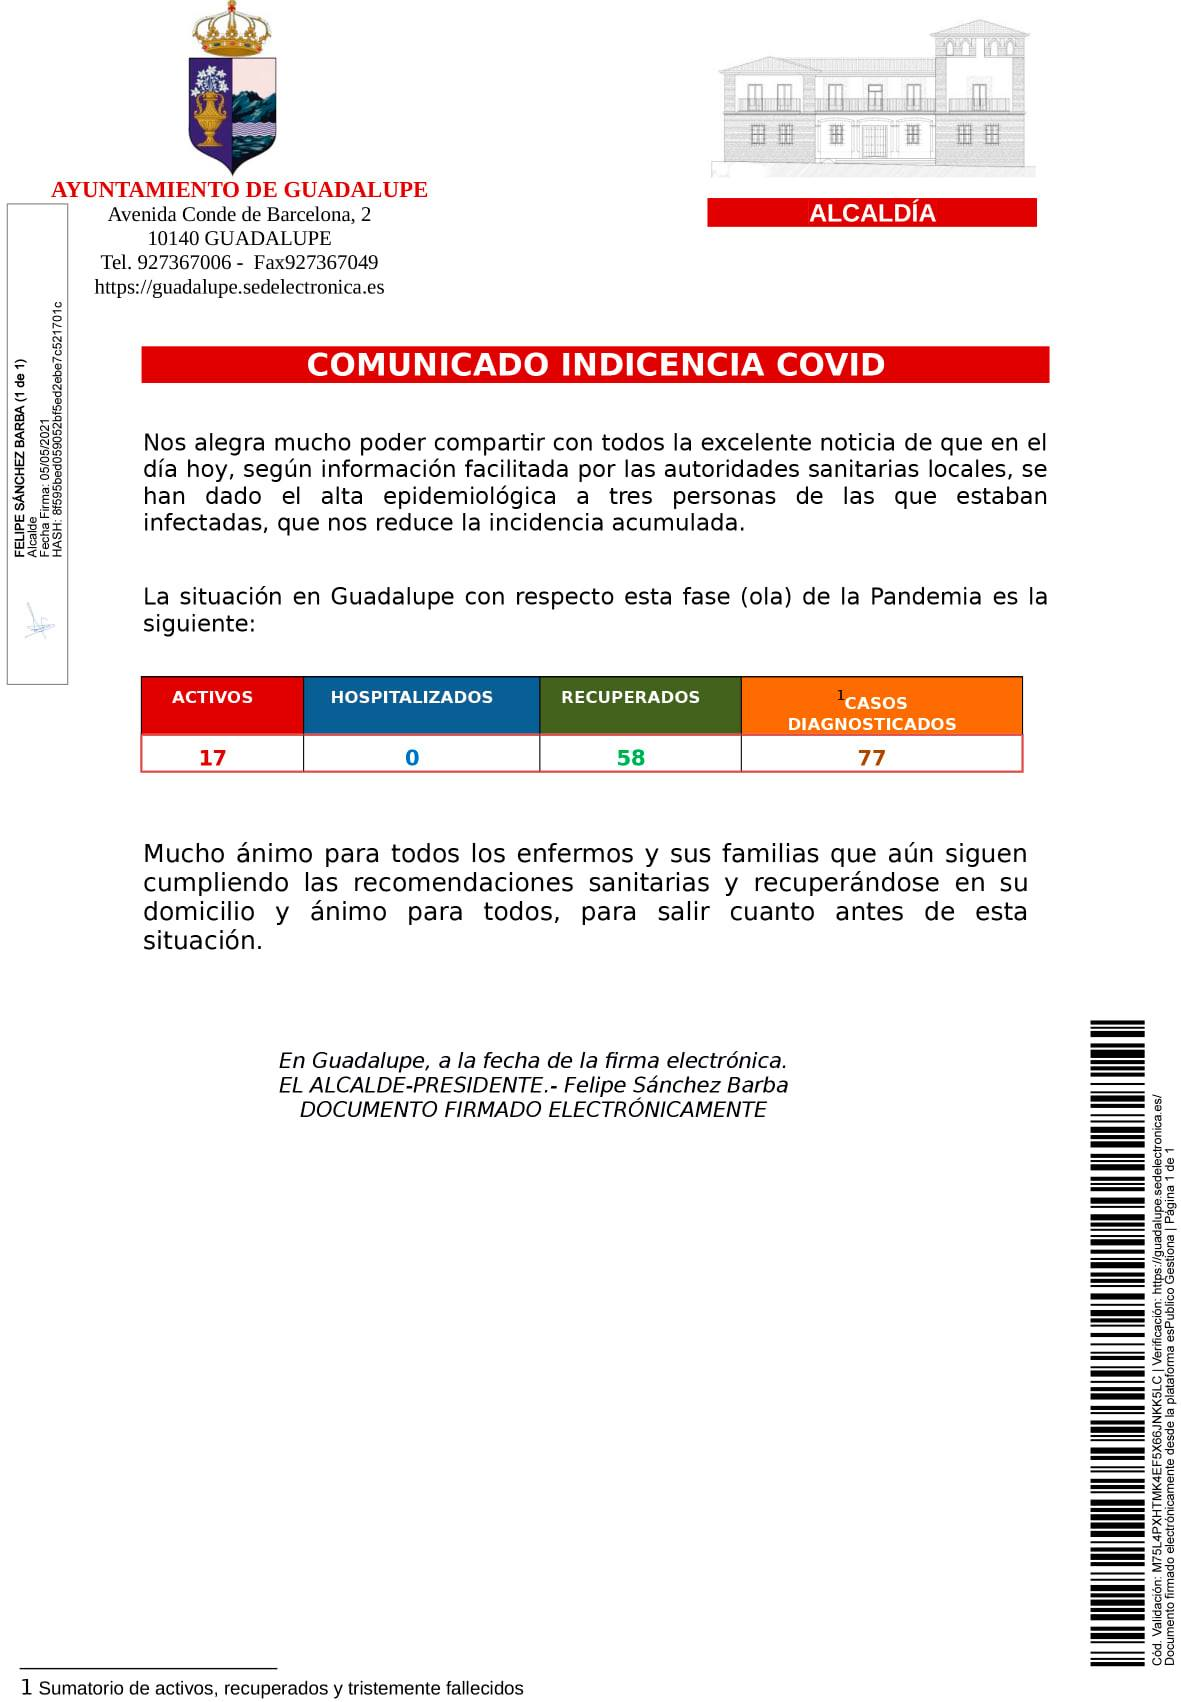 3 altas de COVID-19 (mayo 2021) - Guadalupe (Cáceres)